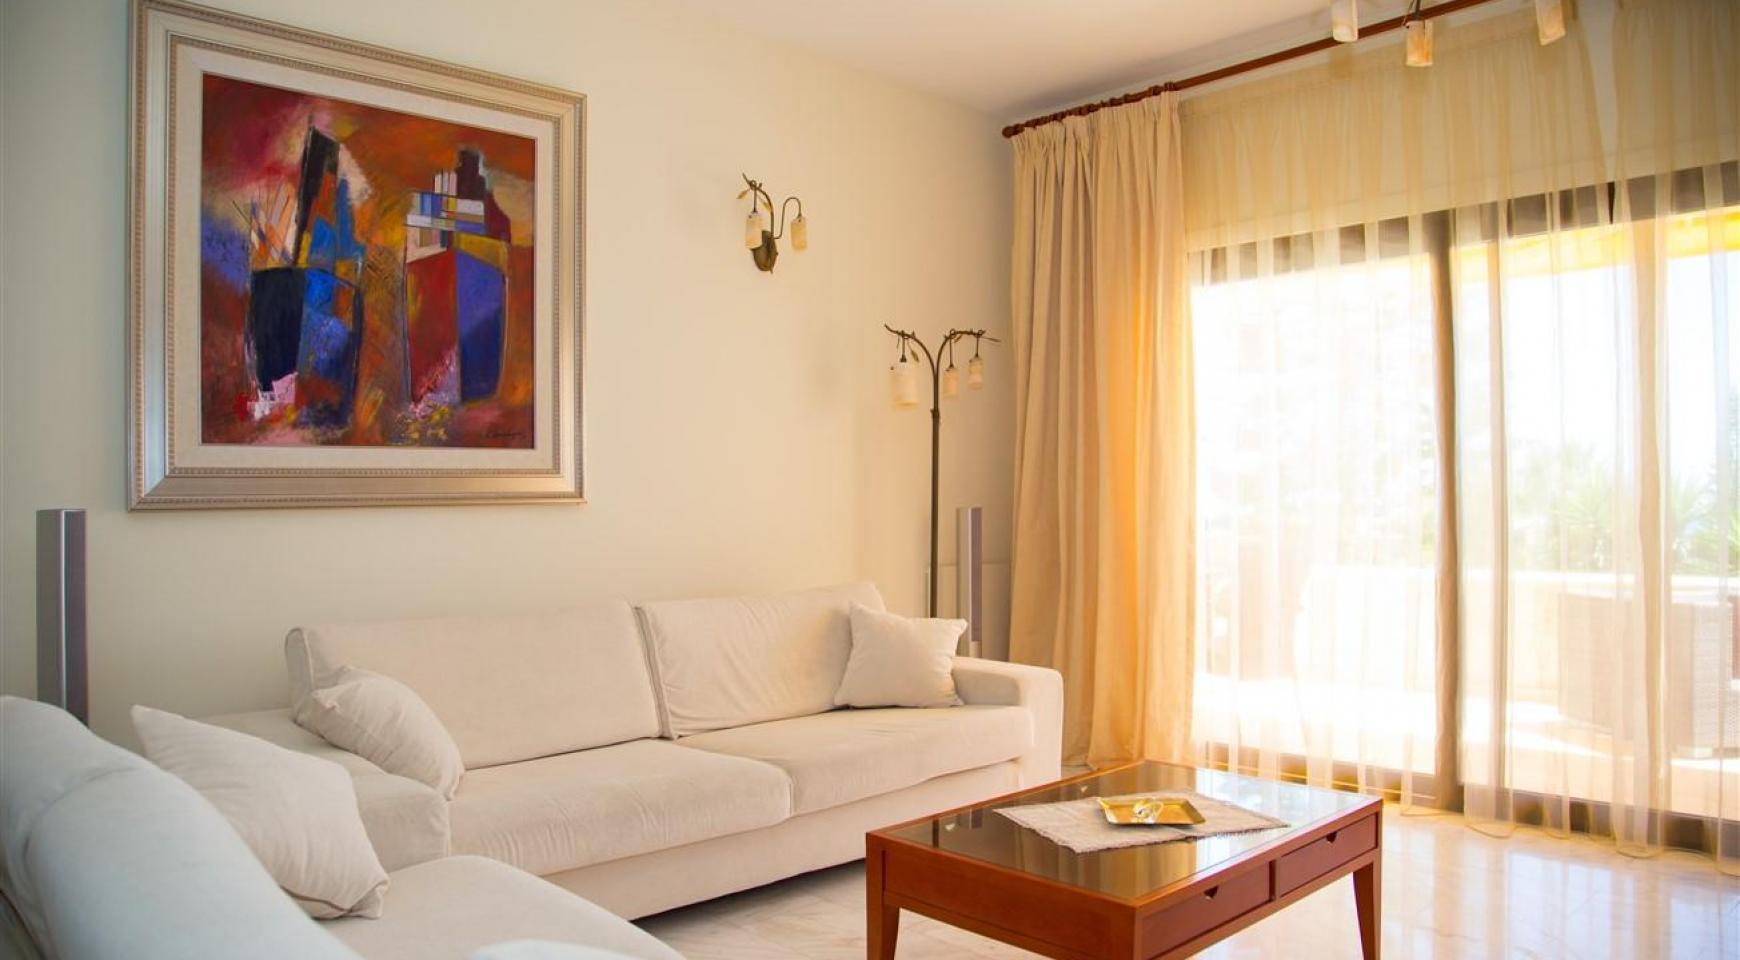 3-Спальная Квартира на Берегу Моря в Комплексе Thera   - 14